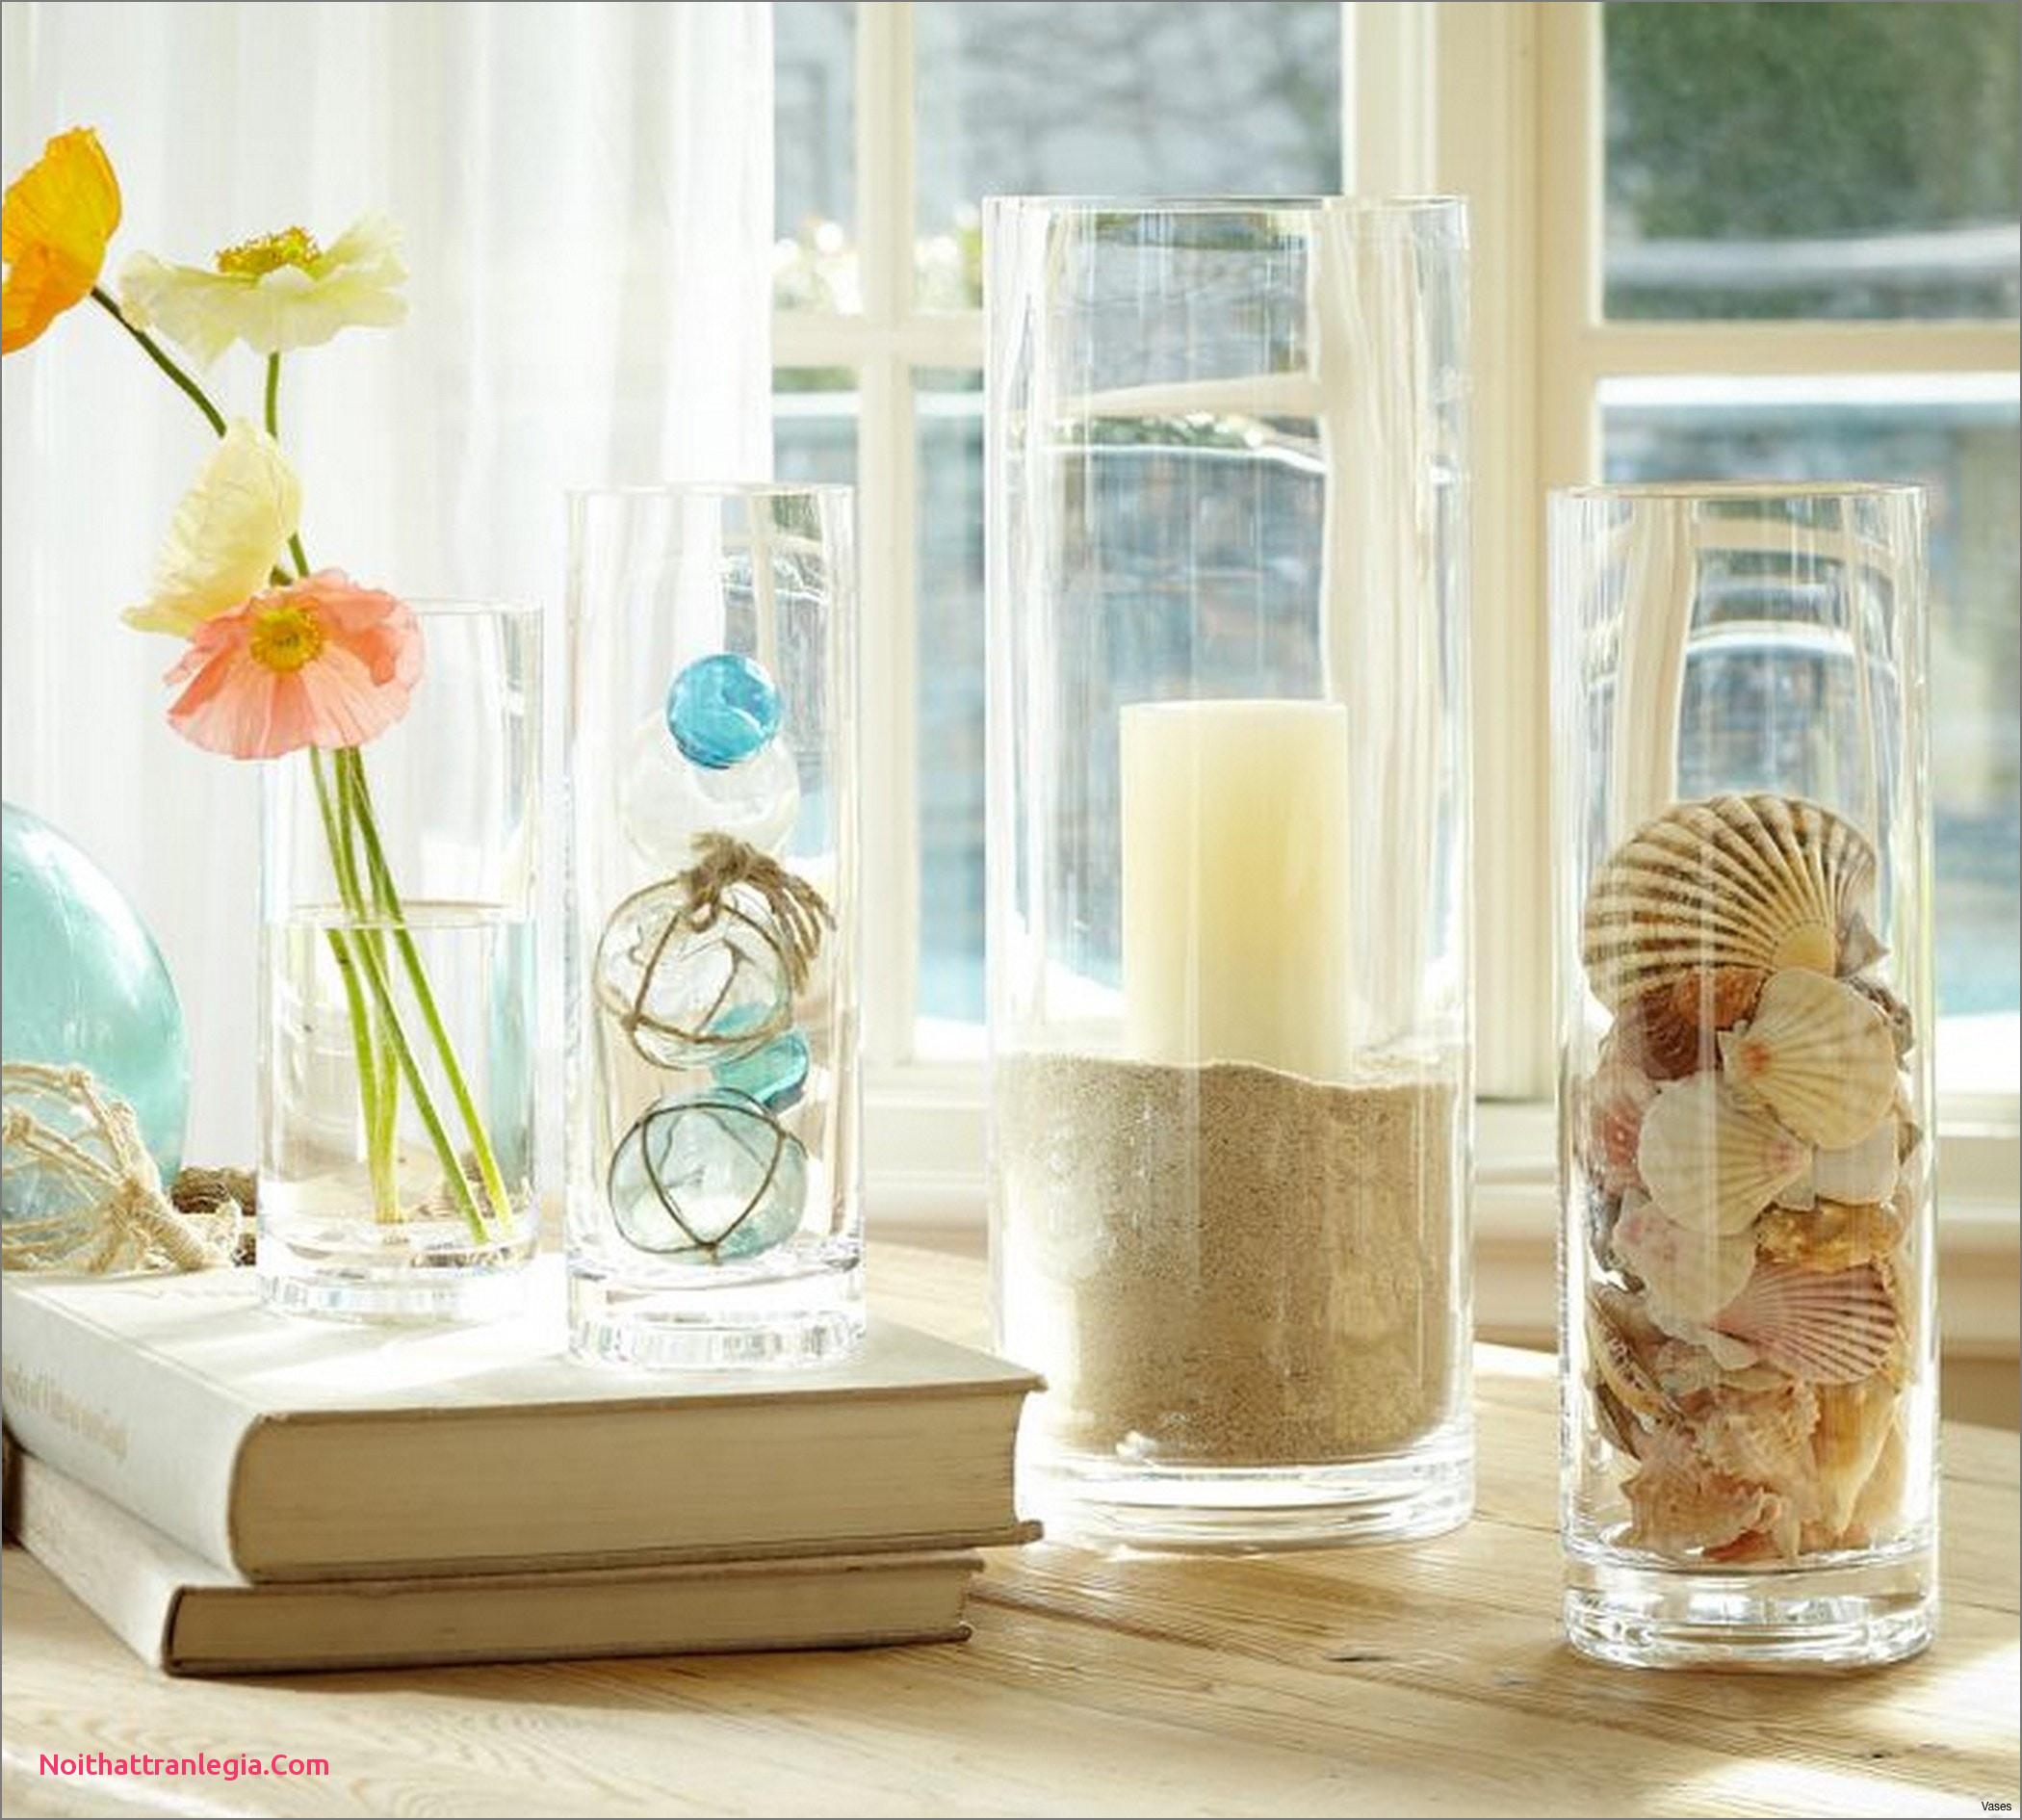 12 Fabulous 20 Glass Cylinder Vases 2021 free download 20 glass cylinder vases of 20 how to make mercury glass vases noithattranlegia vases design throughout glass vase fillers vase filler ideas 5h vases summer 5i 0d inspiration vase